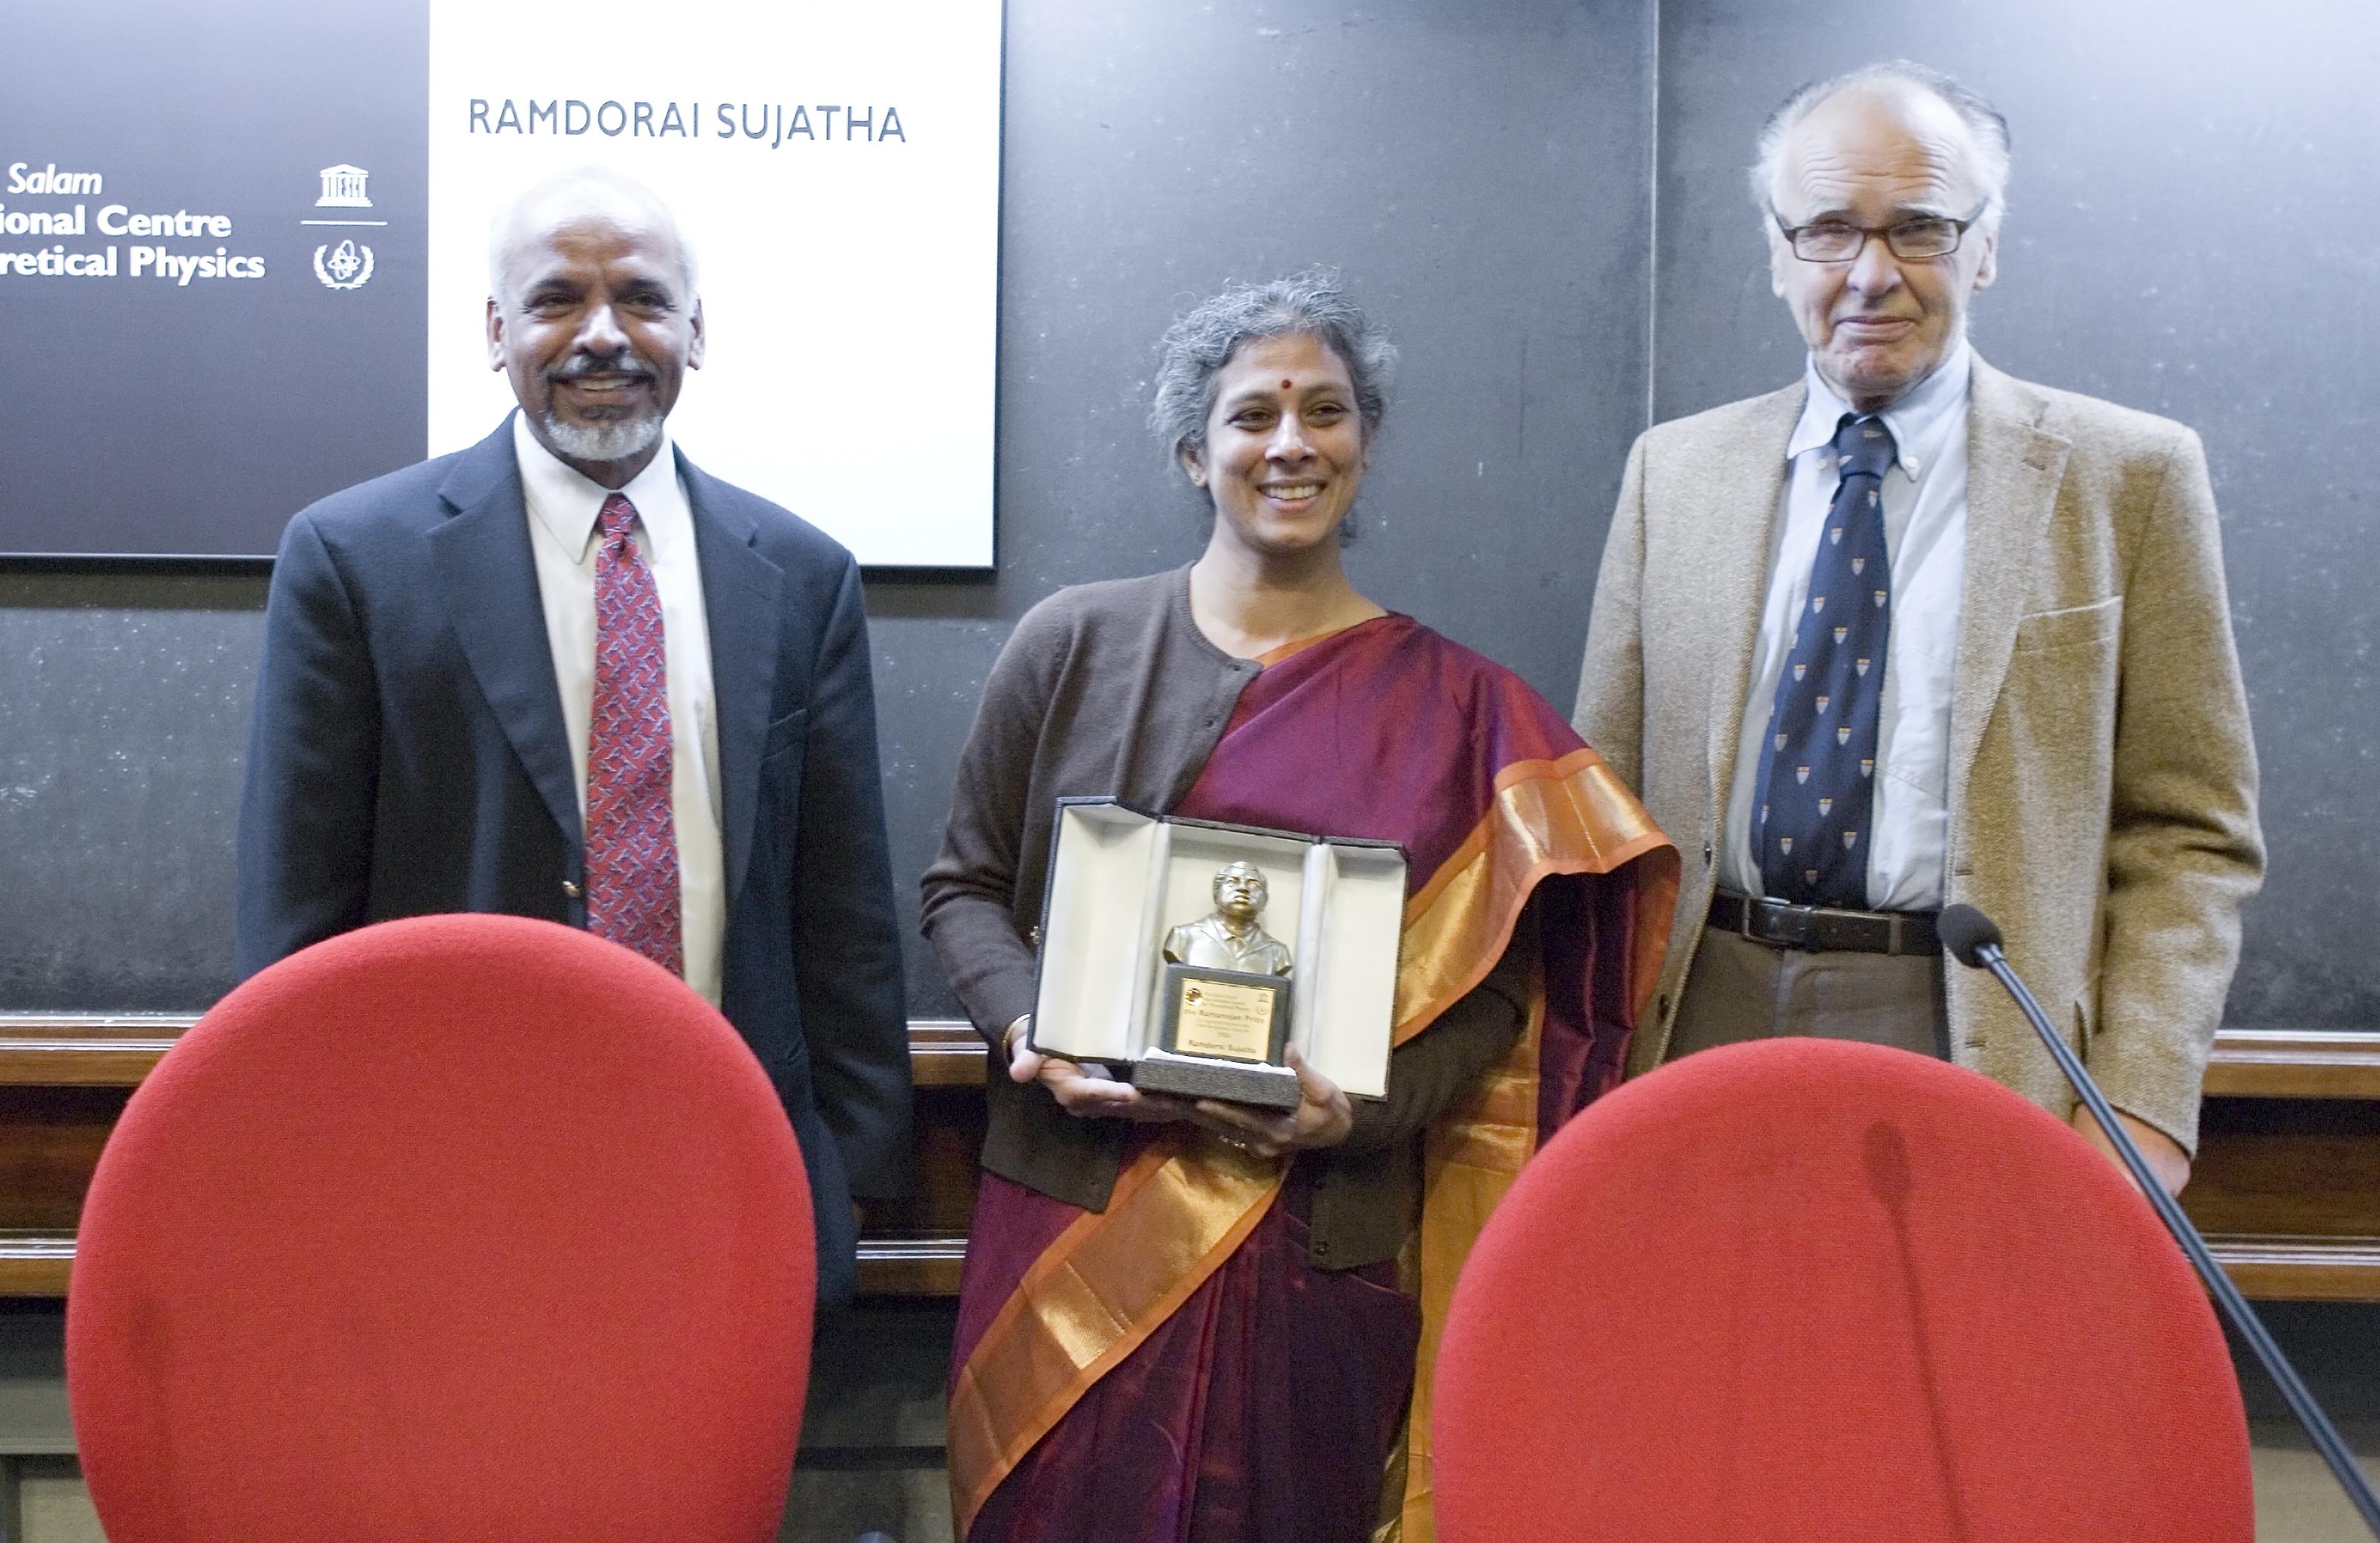 K.R. Sreenivasan, R. Sujatha and L. Carleson